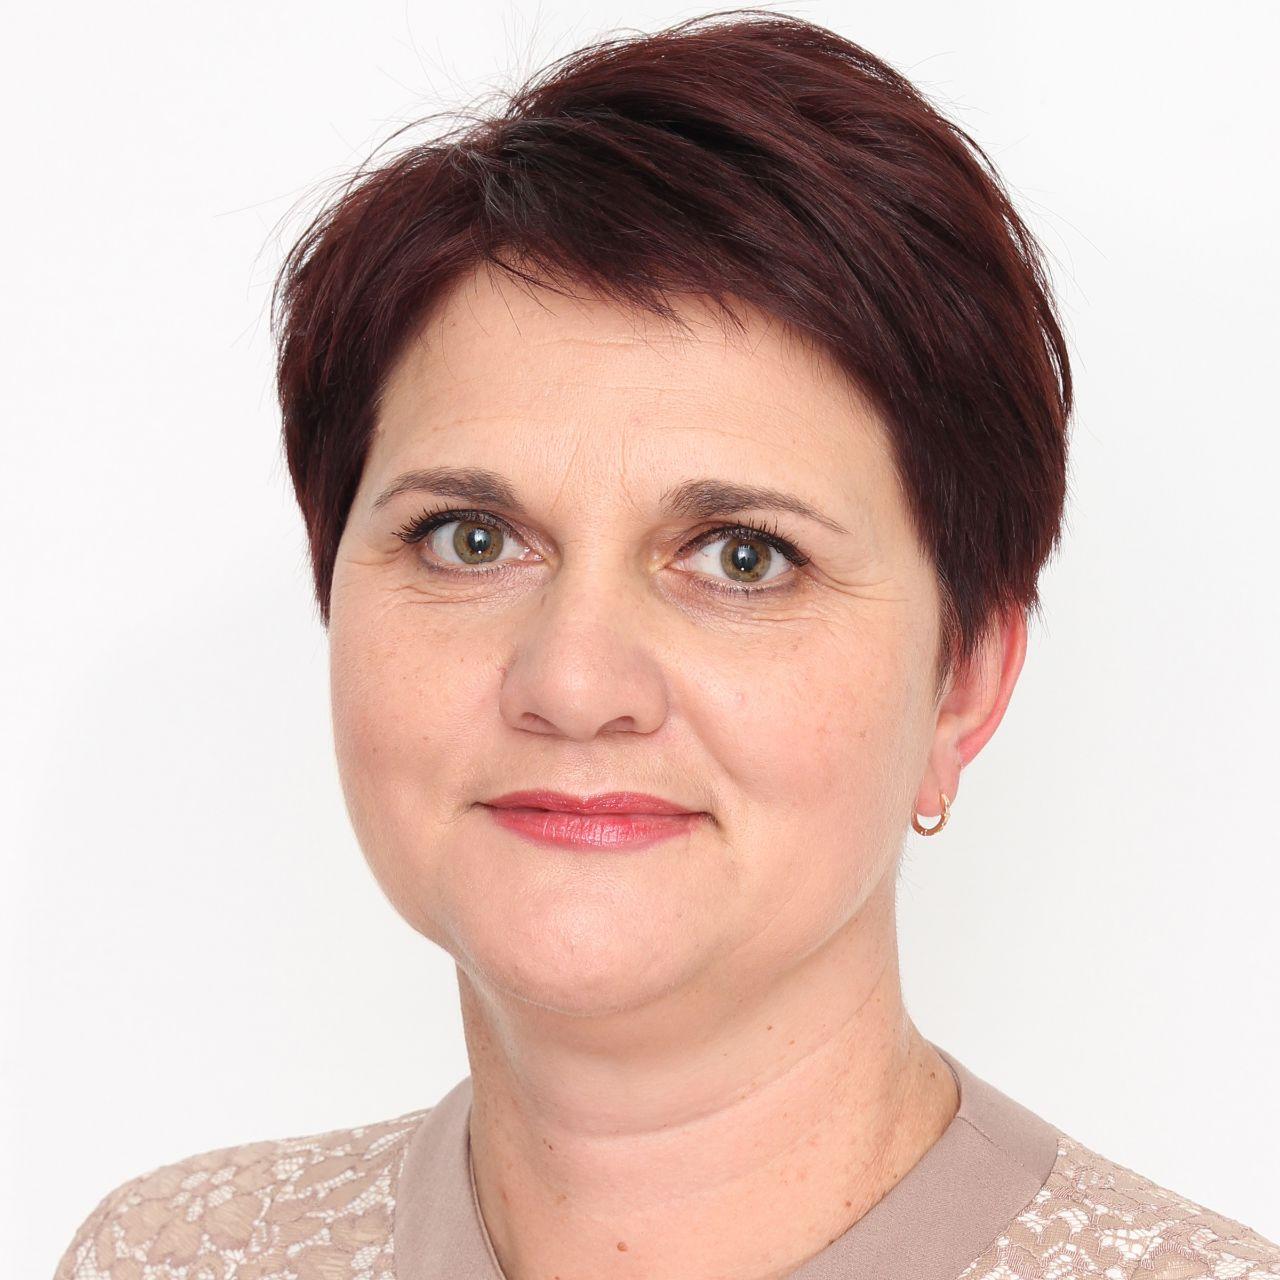 Проценко Катерина Василівна